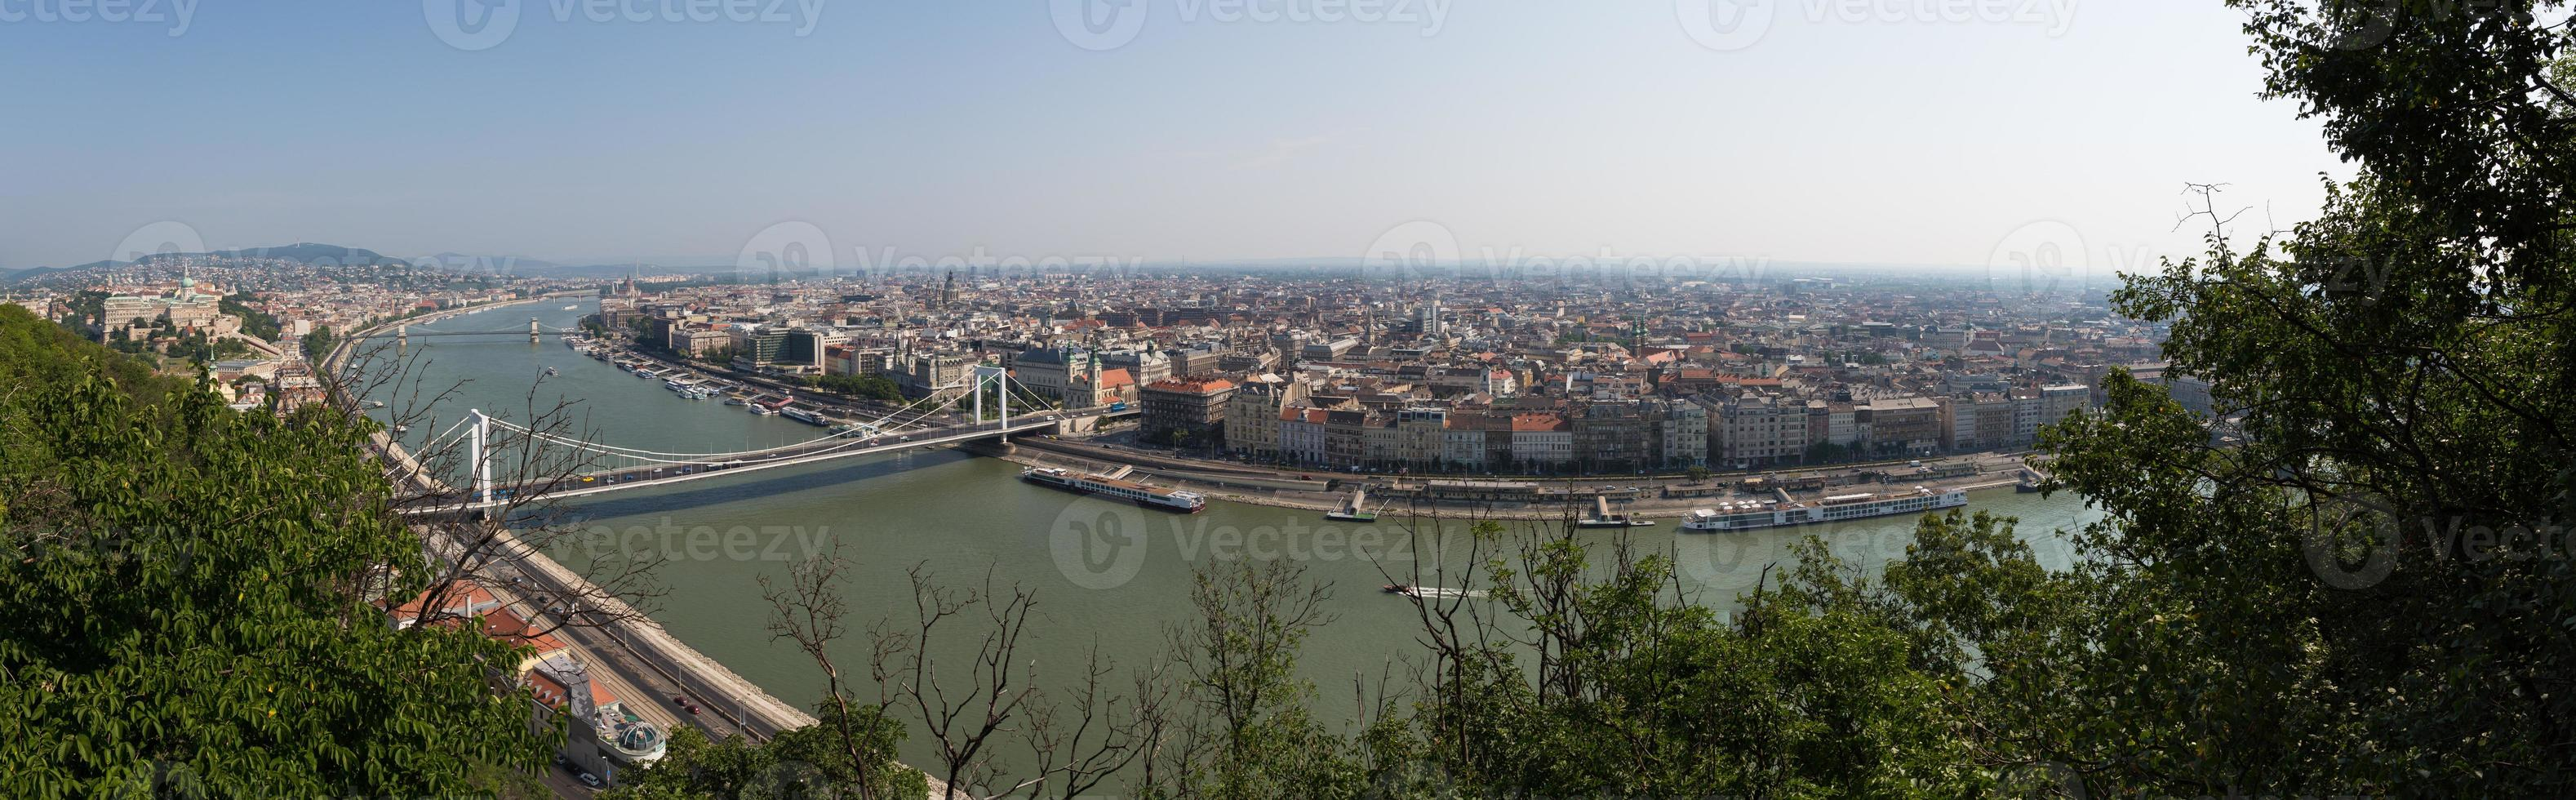 vista panoramica di budapest foto